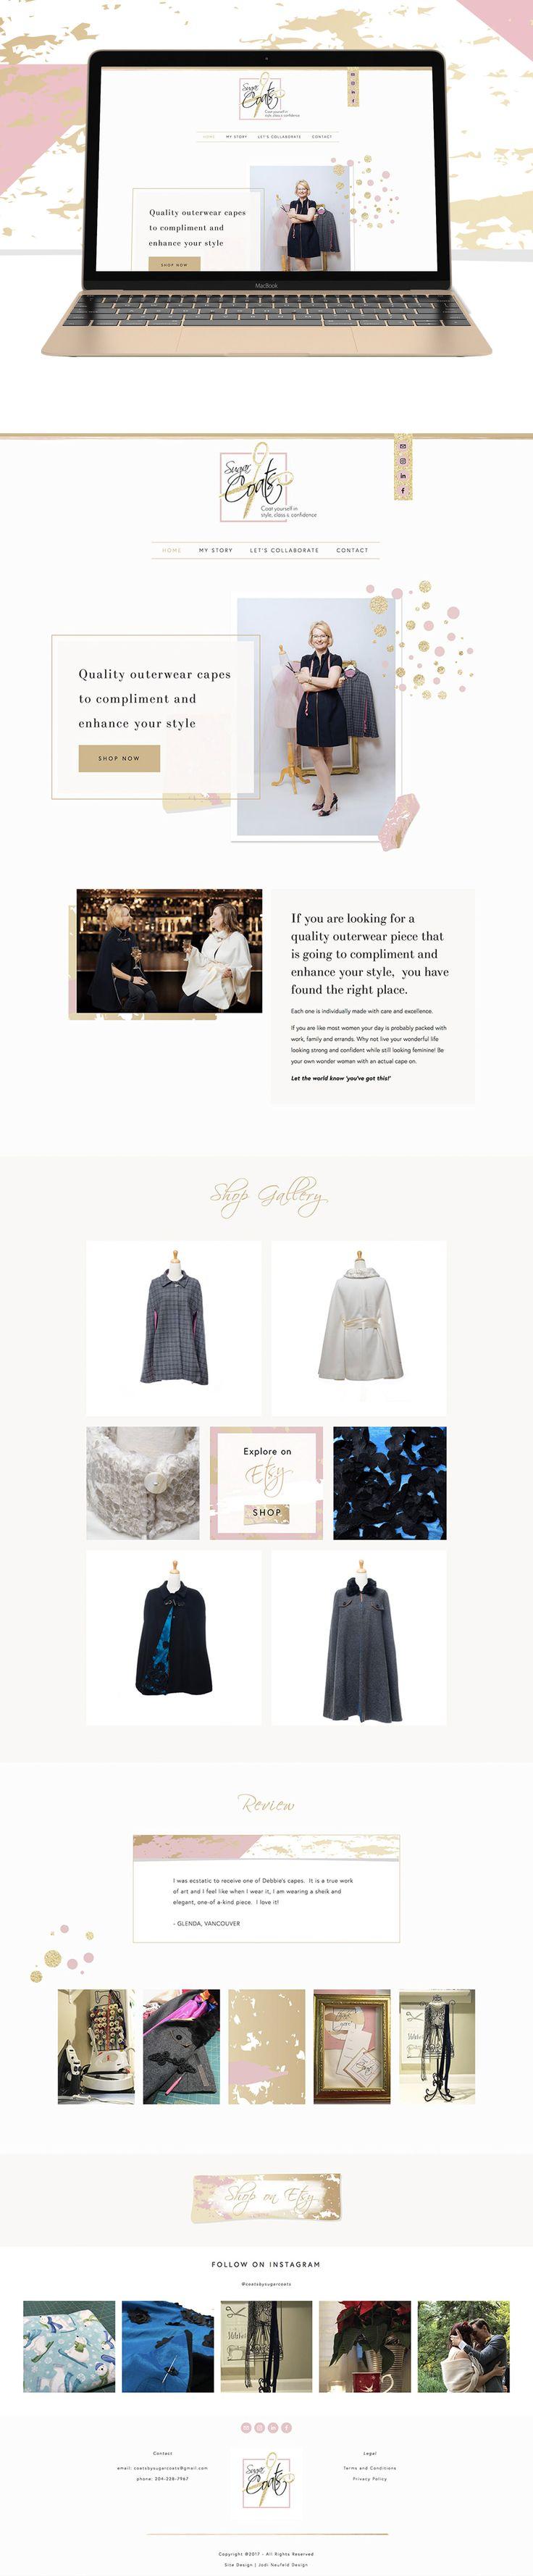 Sugar Coats home page website design | Squarespace website design for Etsy clothing seller by Jodi Neufeld Design